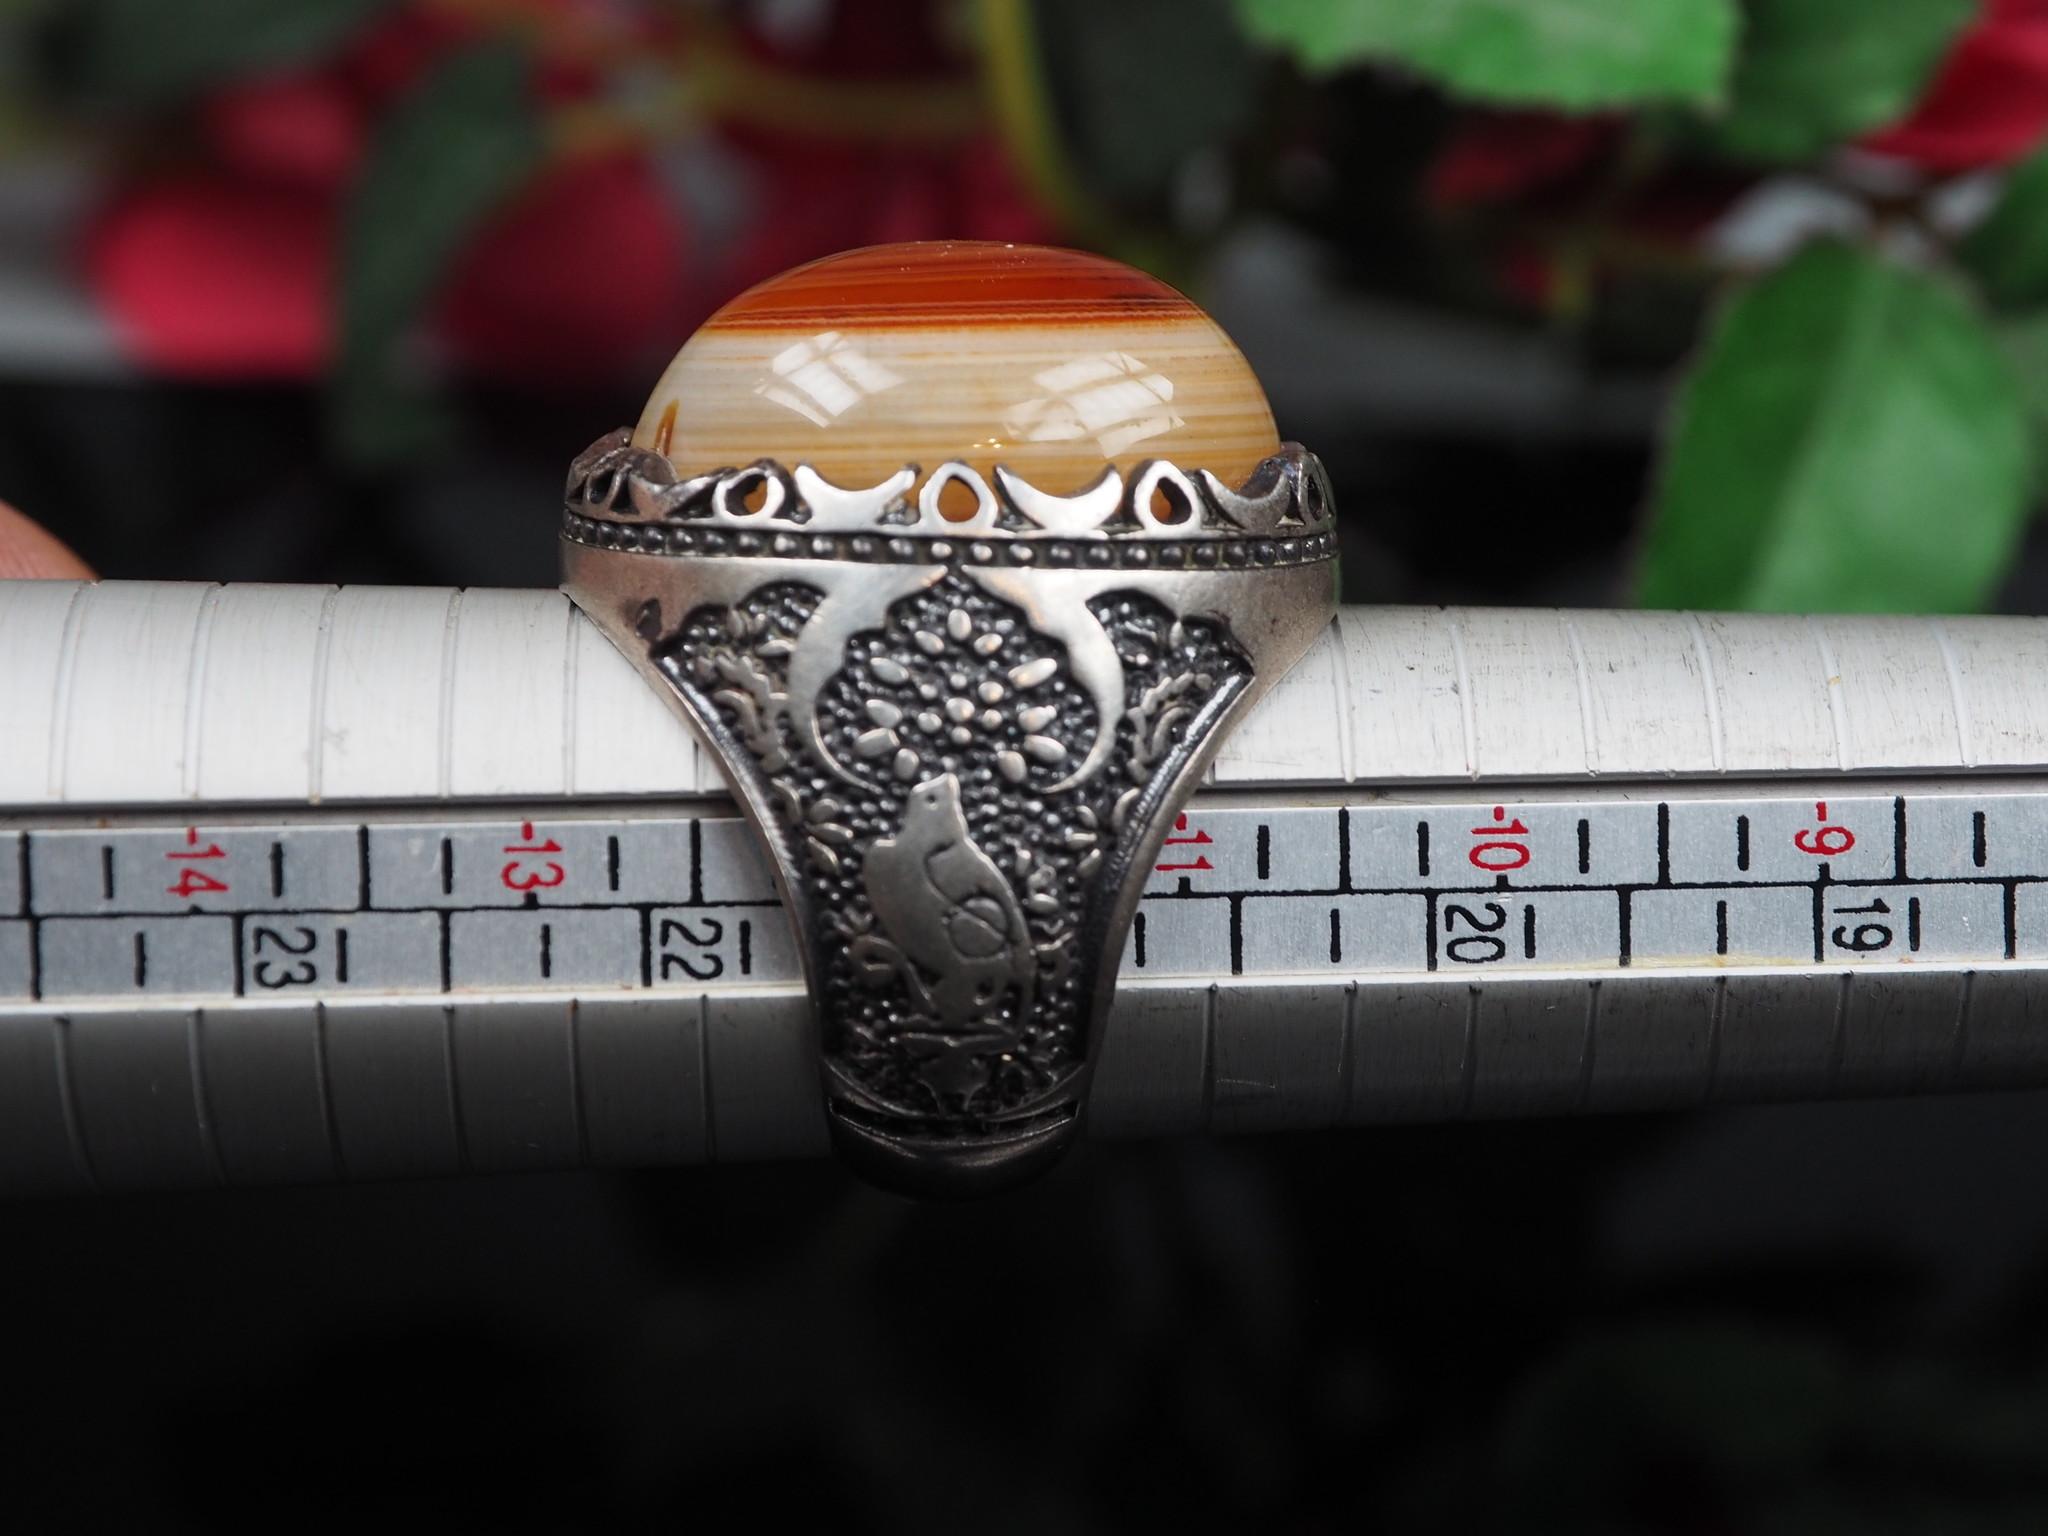 orient Massive silber Augenachat Ring Turkmen Karneol Afghan statement ring aus Afghanistan AQEEQ Nr- WL21/15